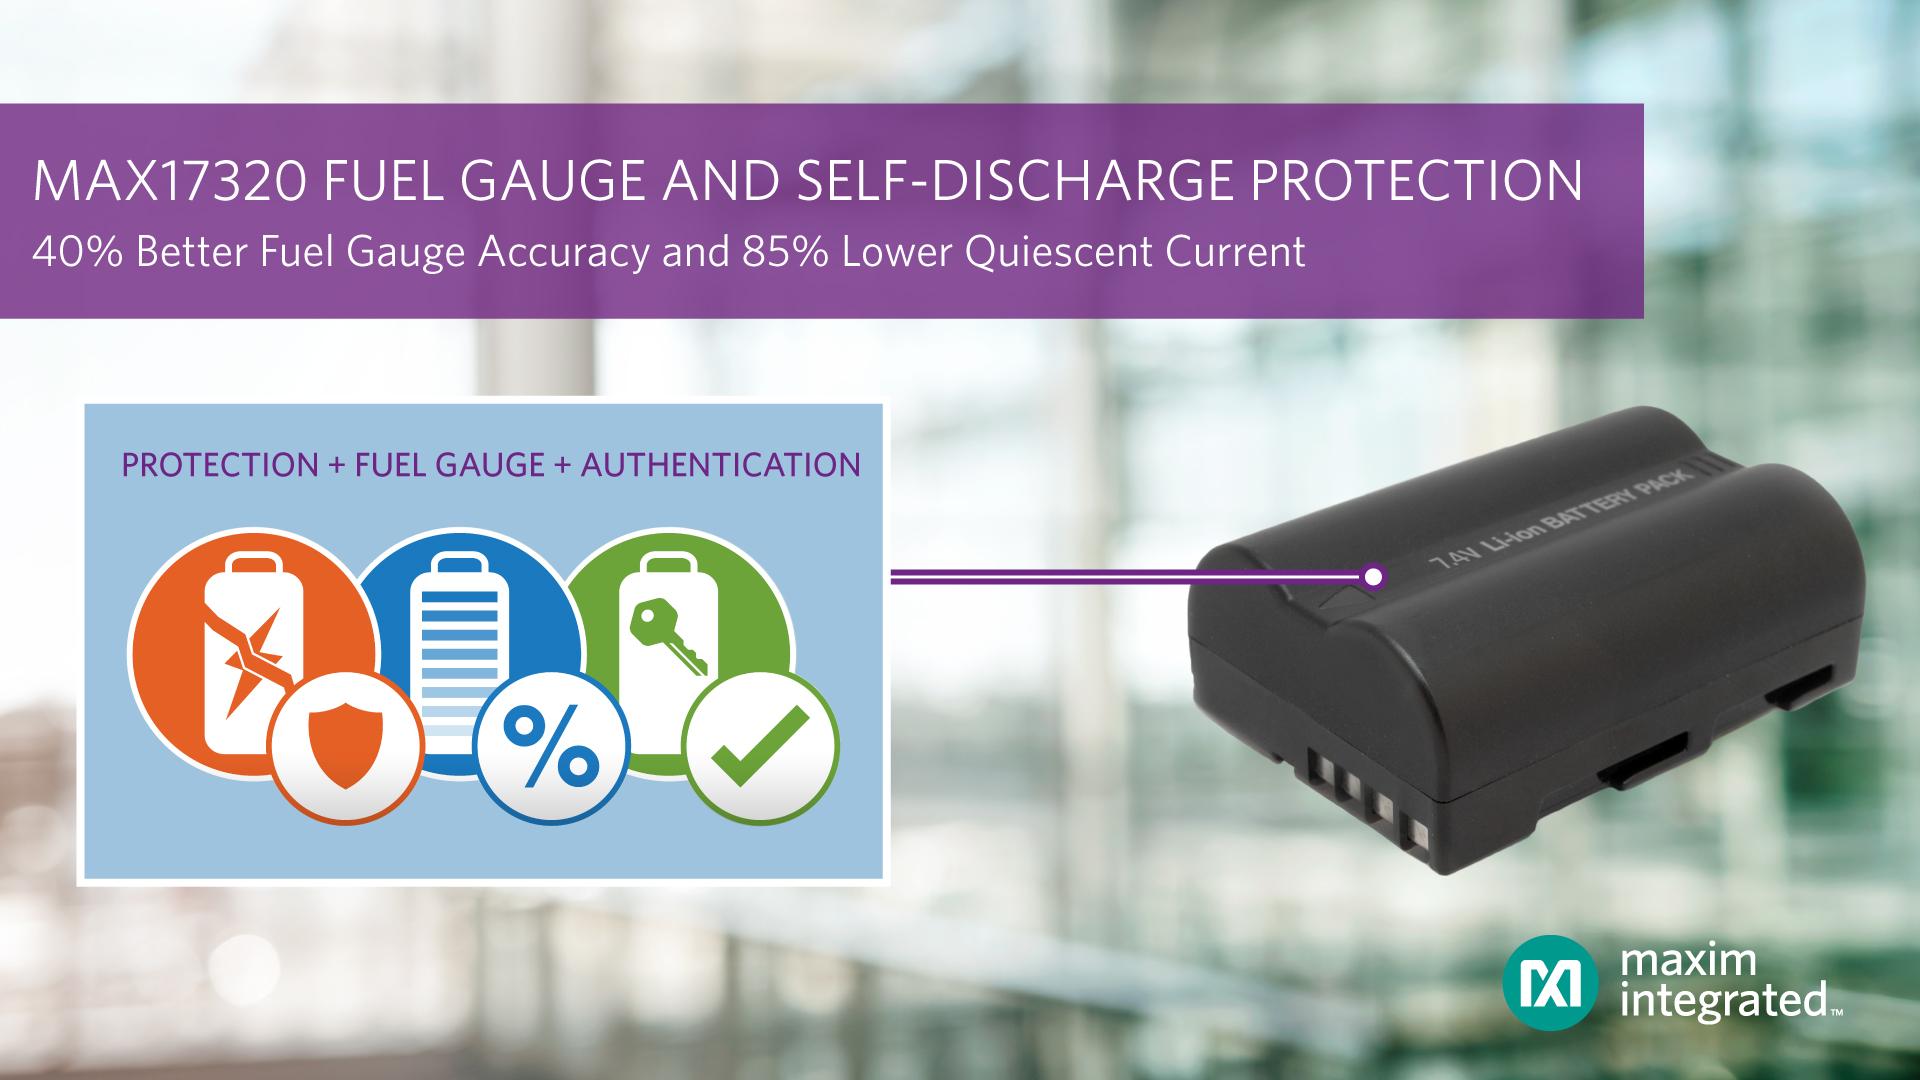 Maxim Integrated发布业界首款可连续监测自放电并提供保护功能的锂离子电池电量计